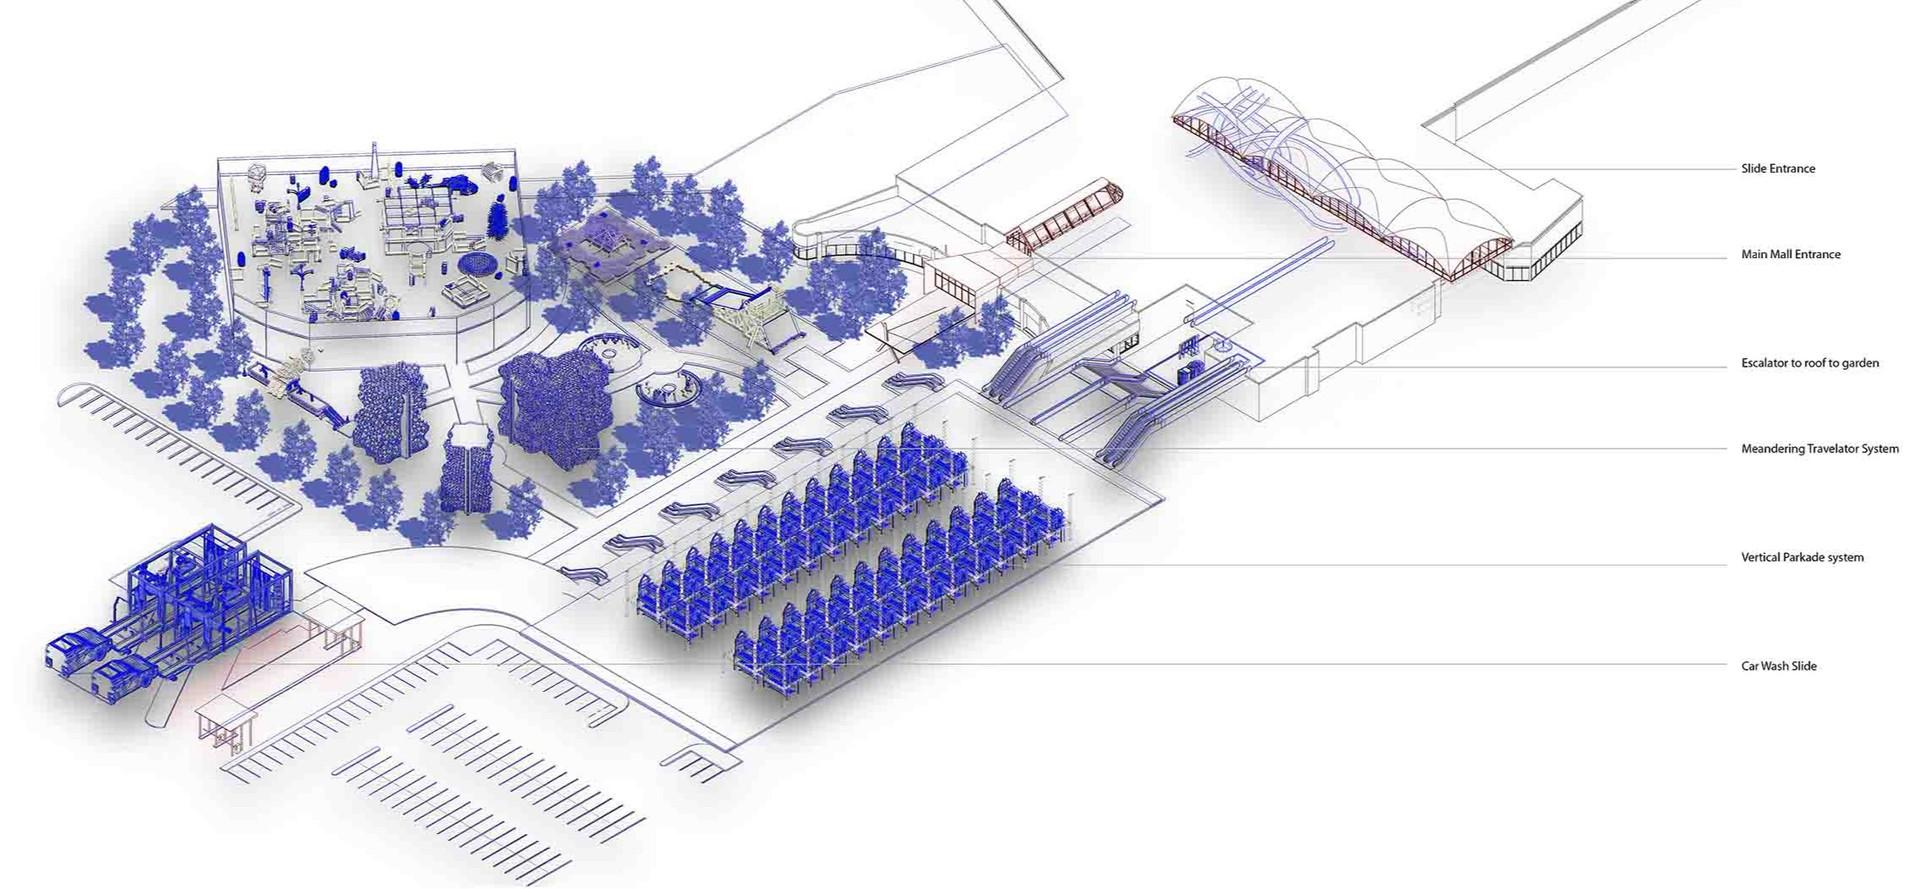 Reconfigured Mall. Ramnath, N. Unit 14. 2020.